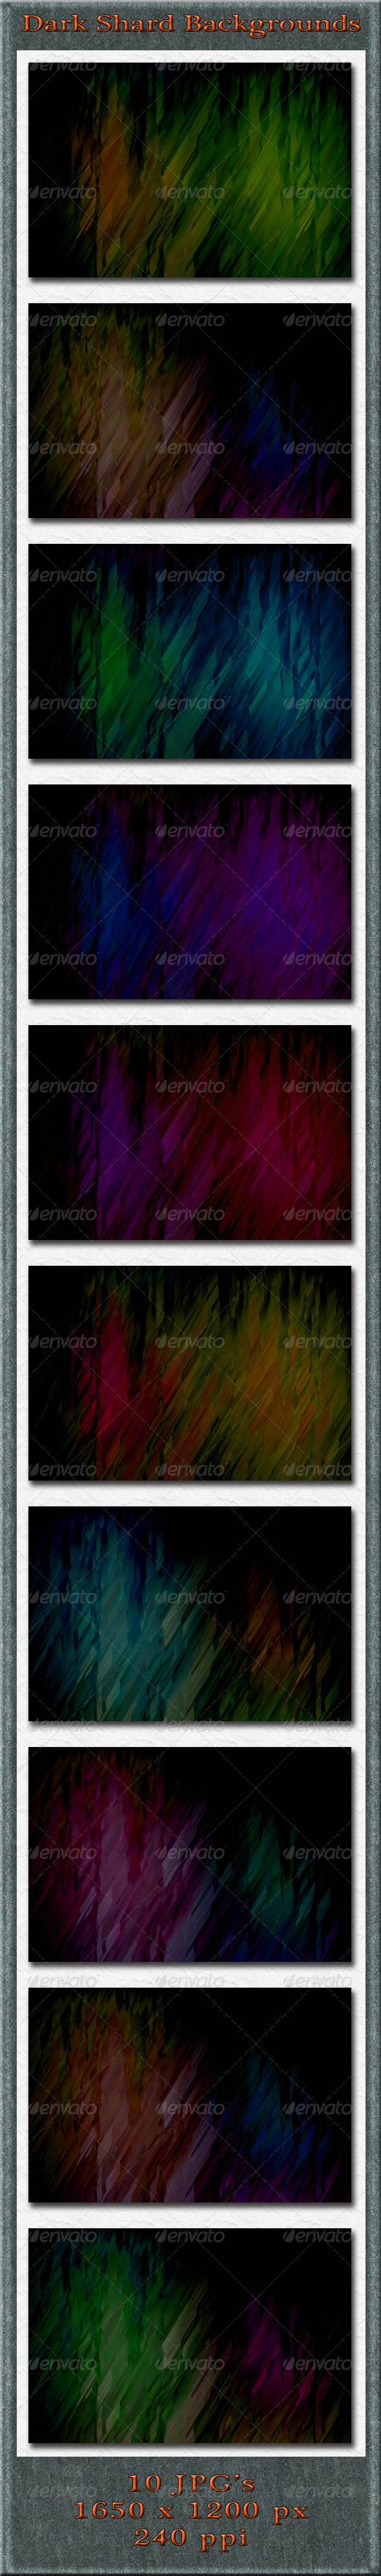 GraphicRiver Dark Shard Backgrounds 4882892